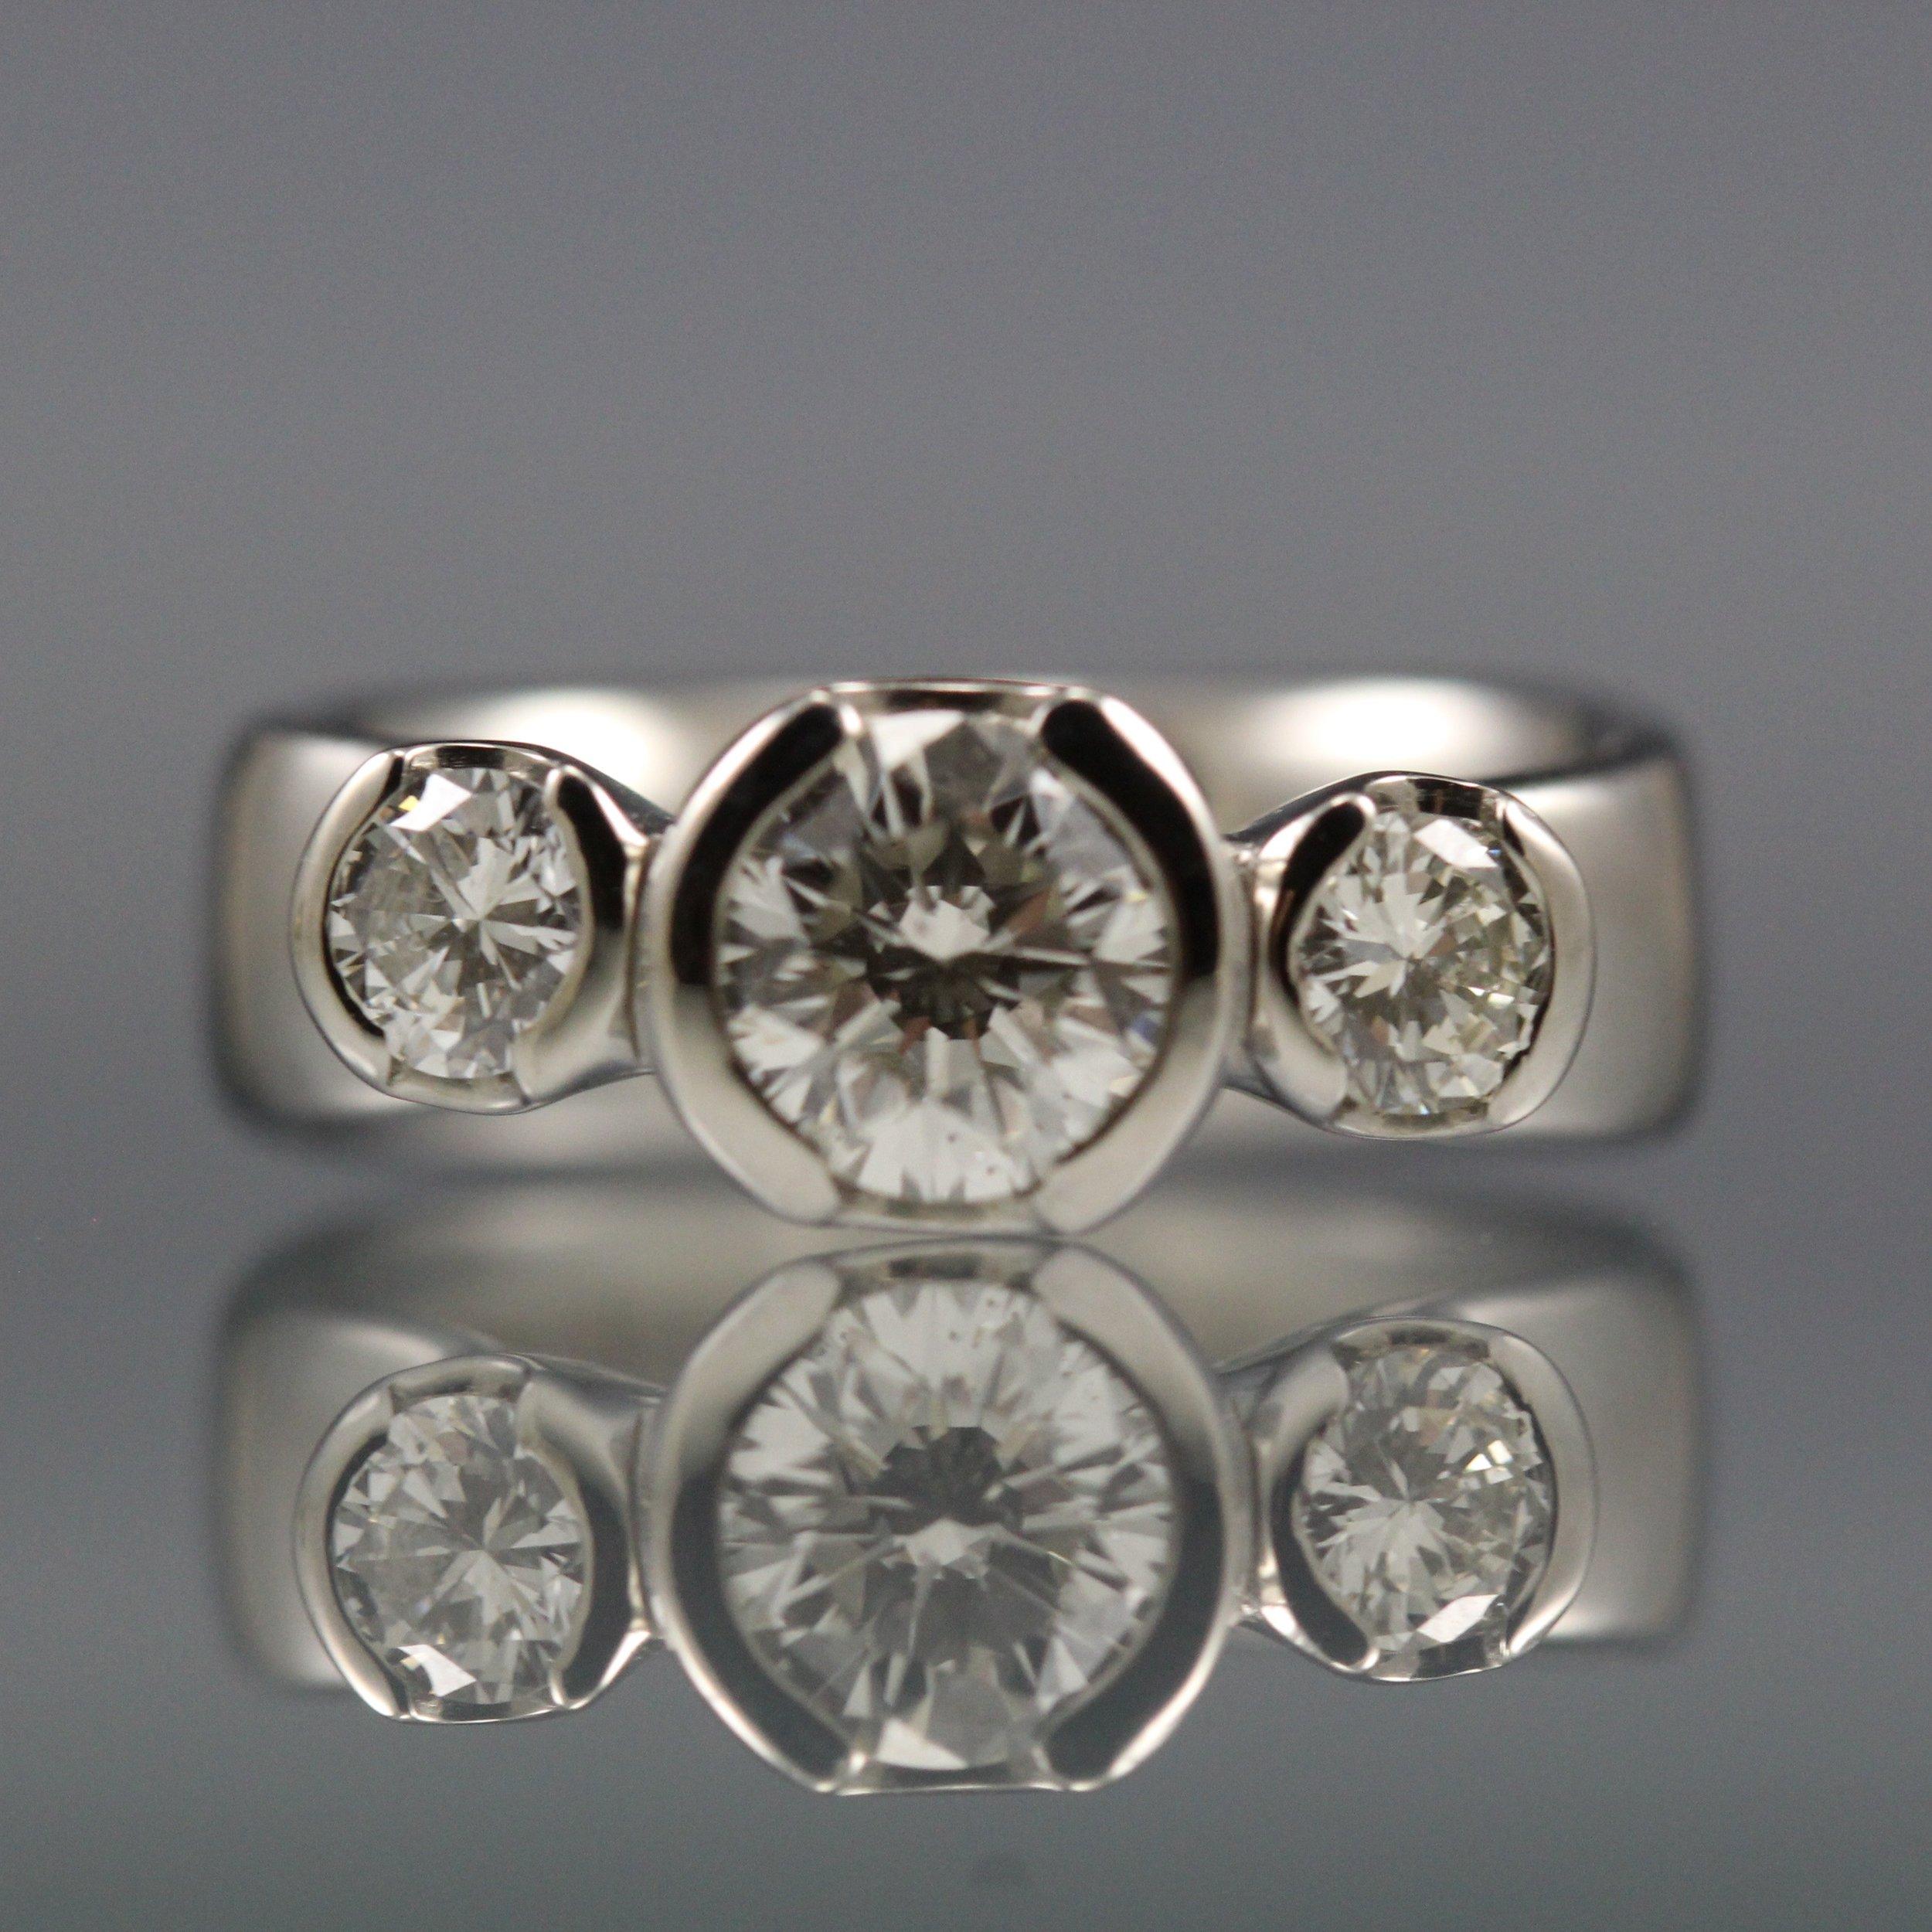 Custom made palladium and diamond ring made by Danielle Miller Jewelry